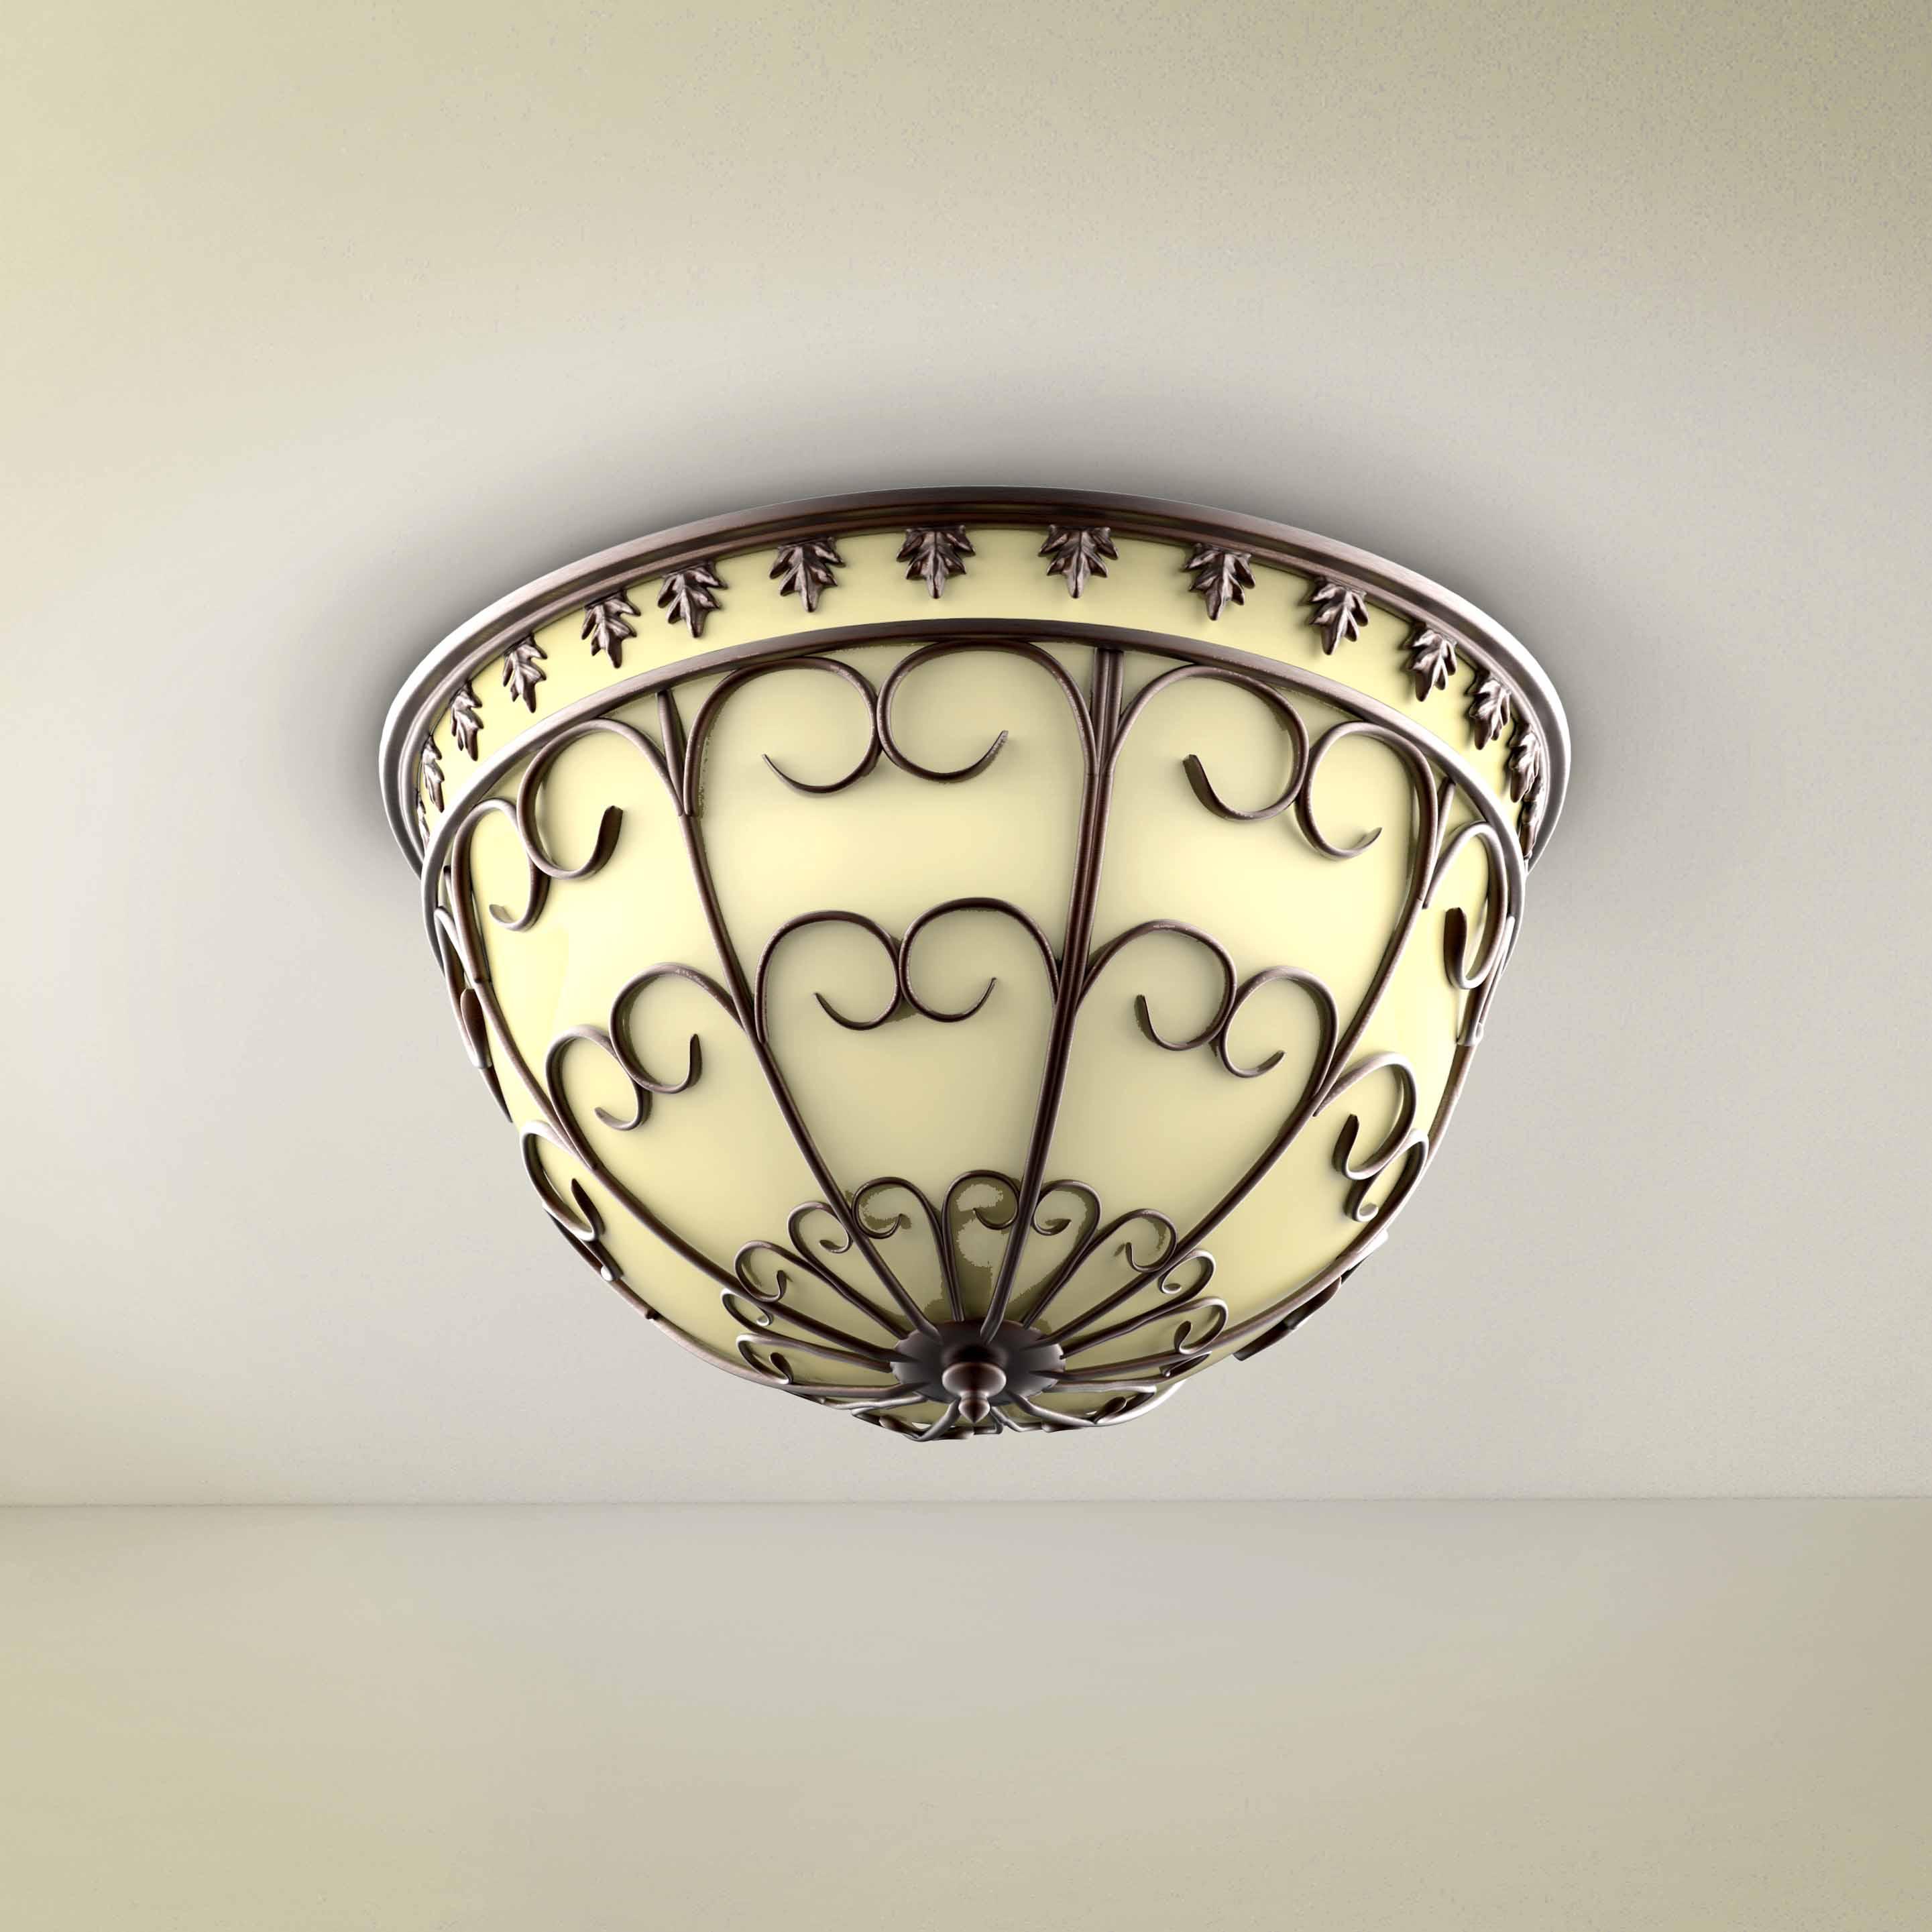 Round Vintage Ornament Chandelier - 3D Product